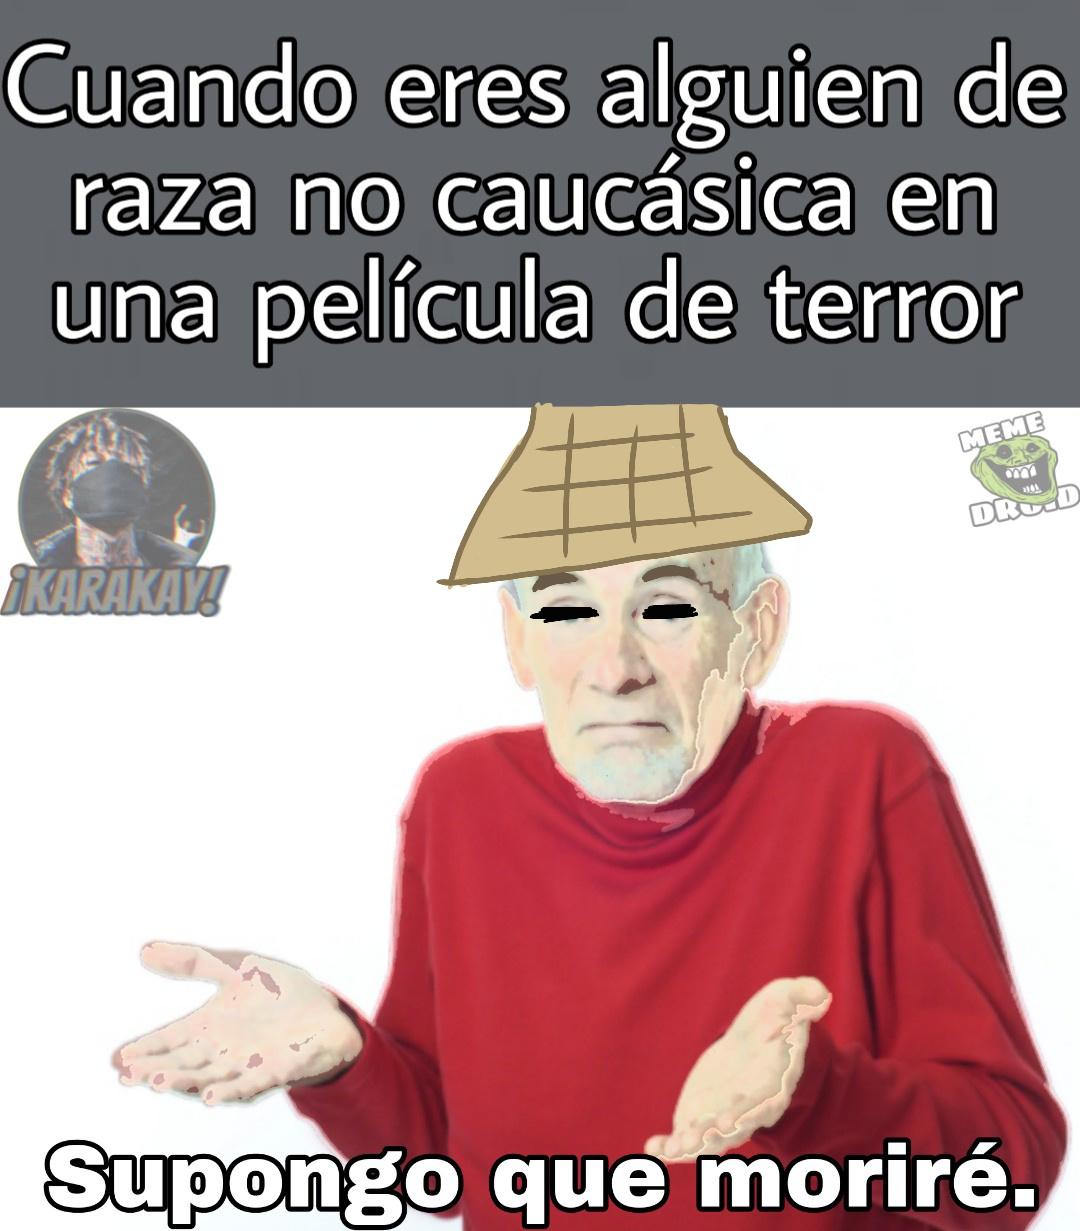 güen forint - meme